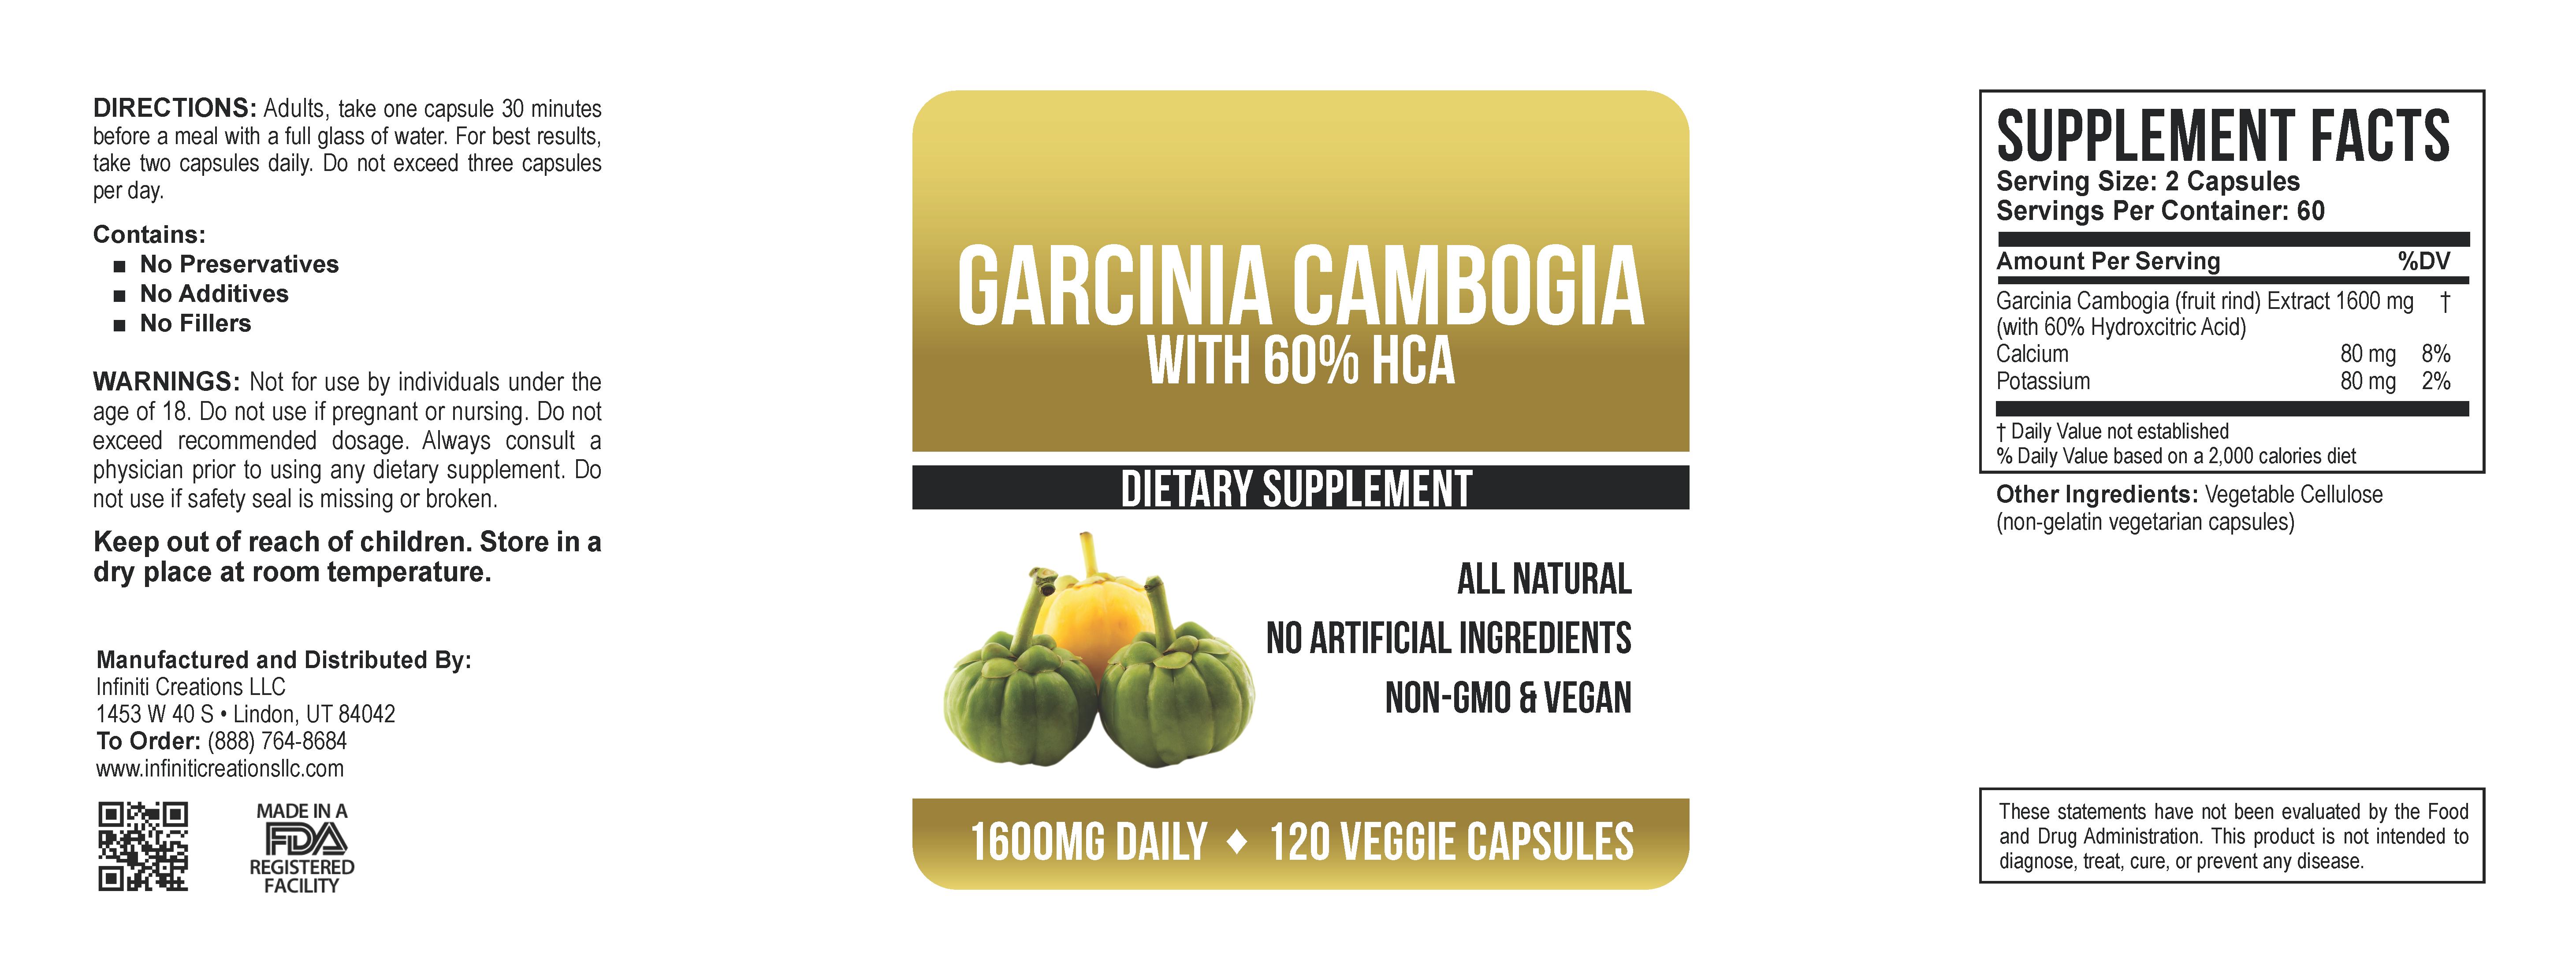 infiniti-creations-garcinia-cambogia-60-120ct-v2.png